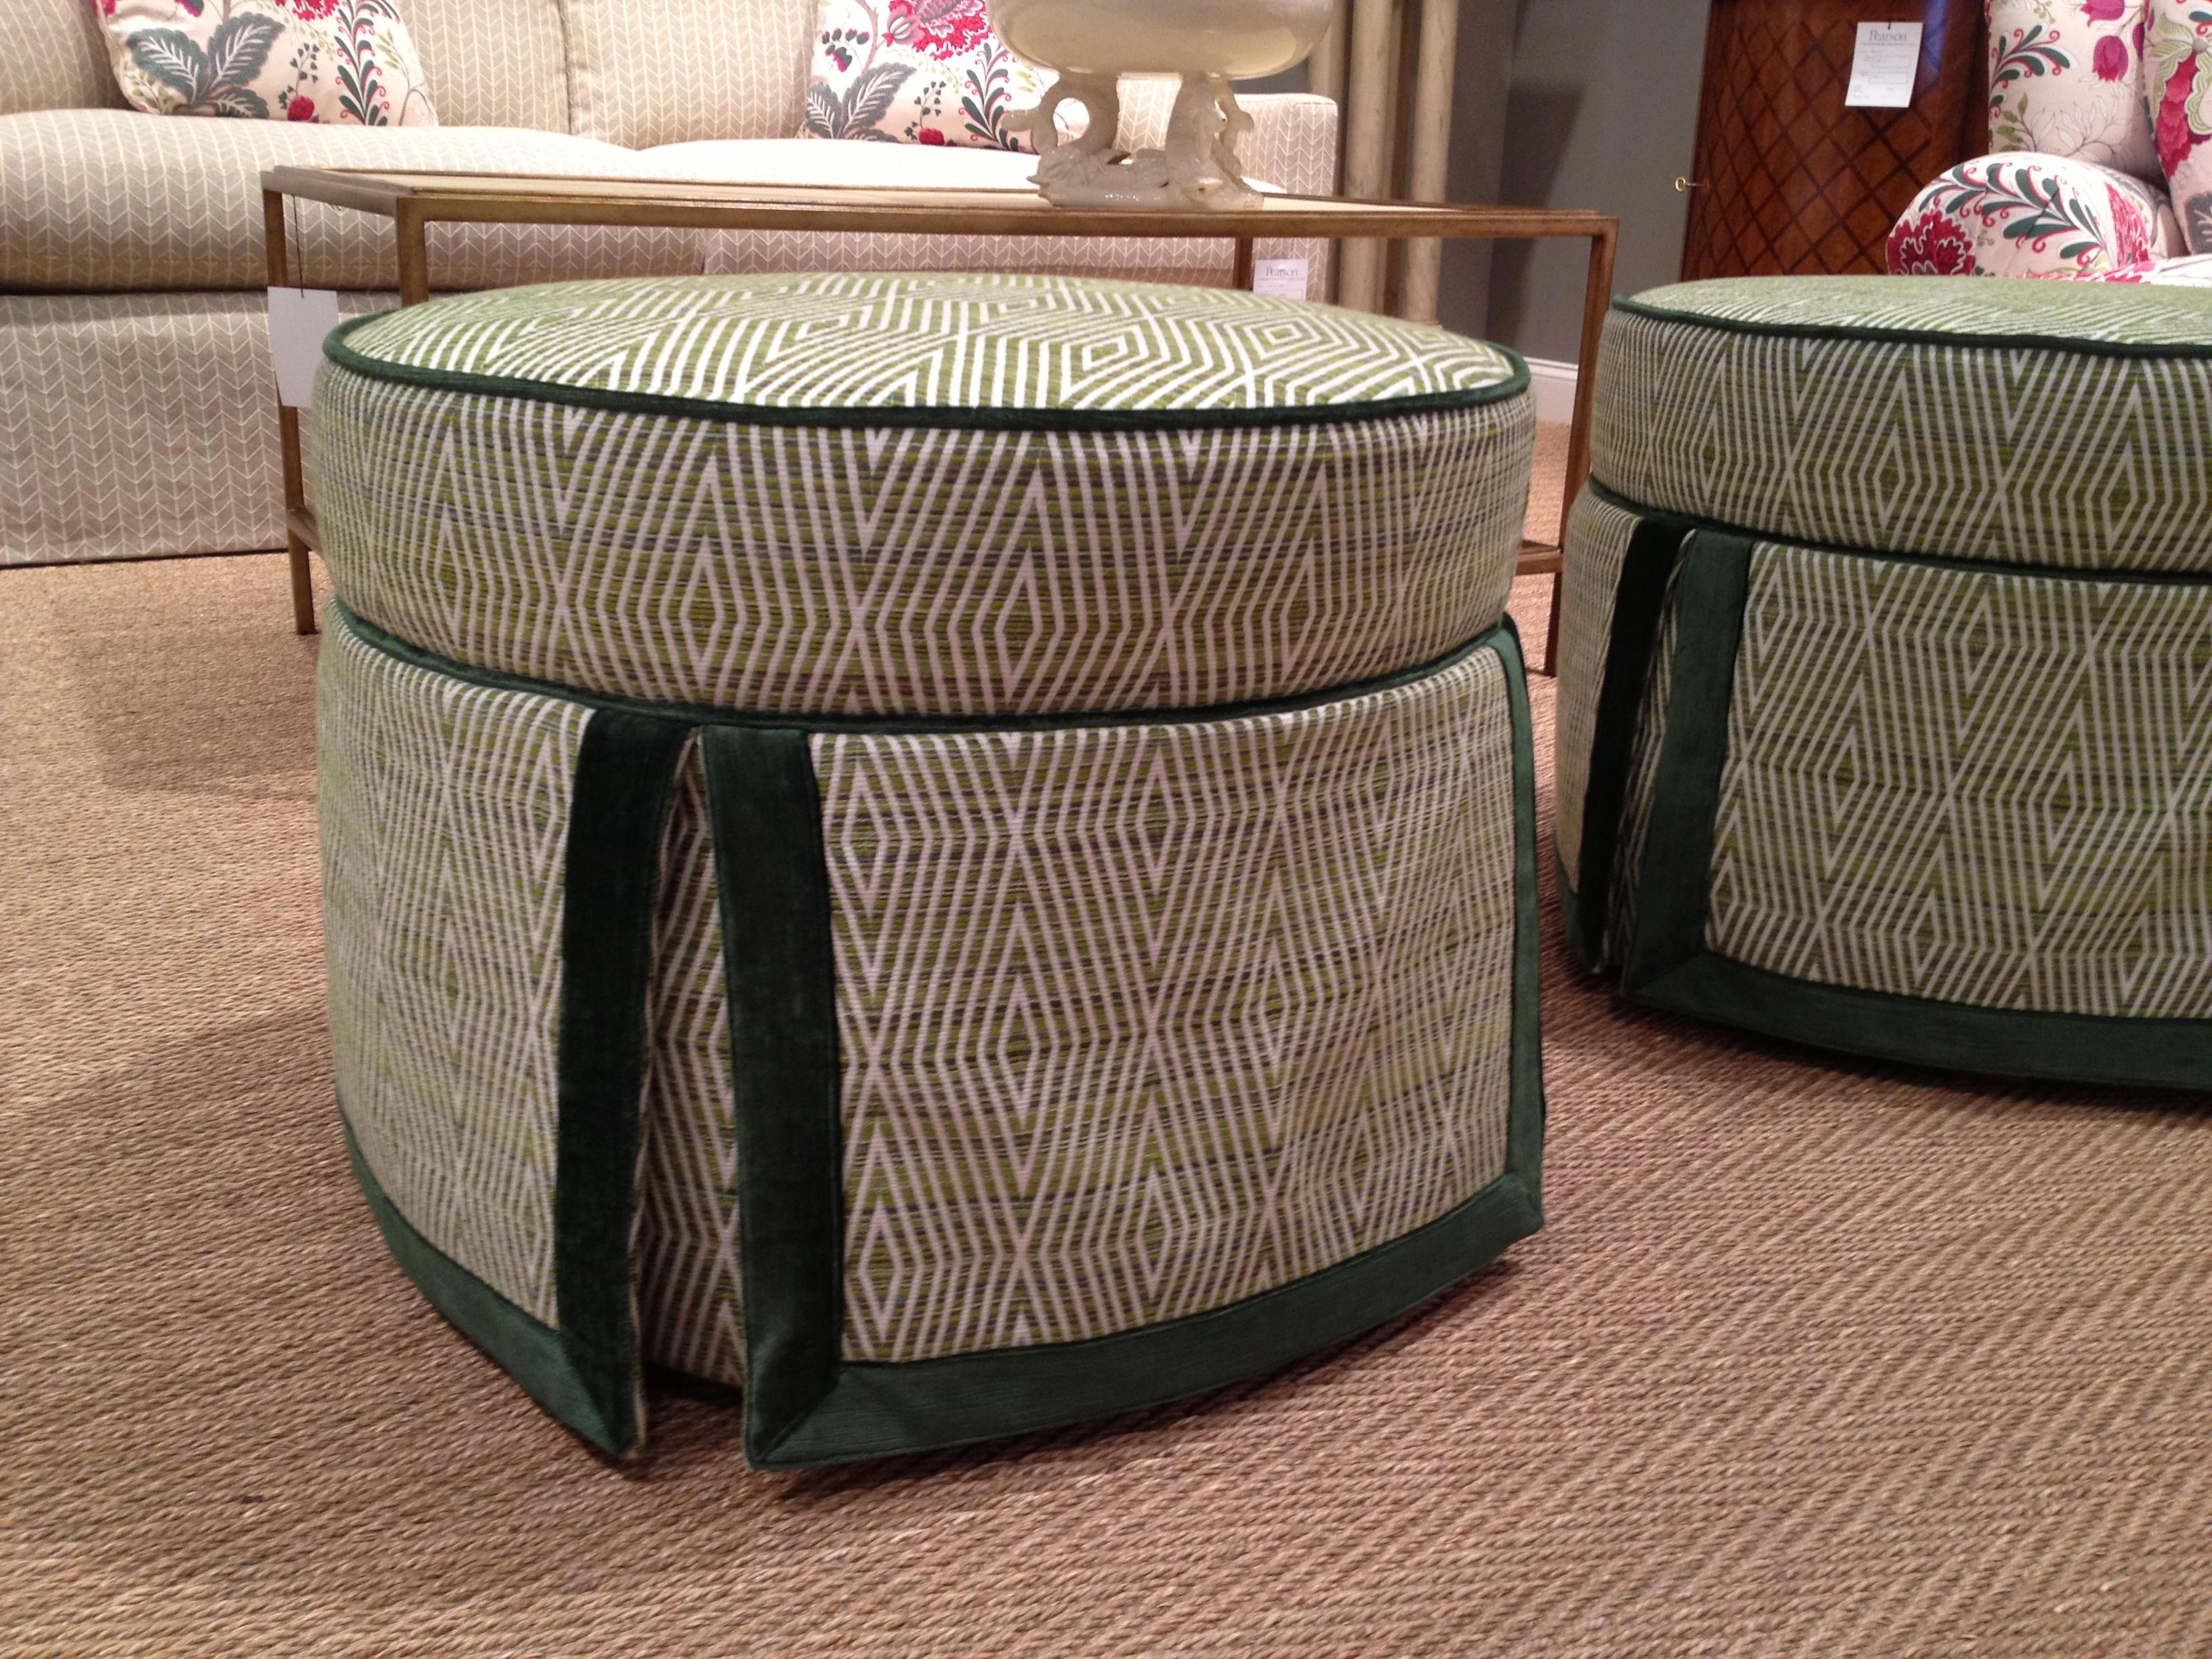 Pearson Furniture skirted ottoman with emerald green velvet welt and border #hpmkt